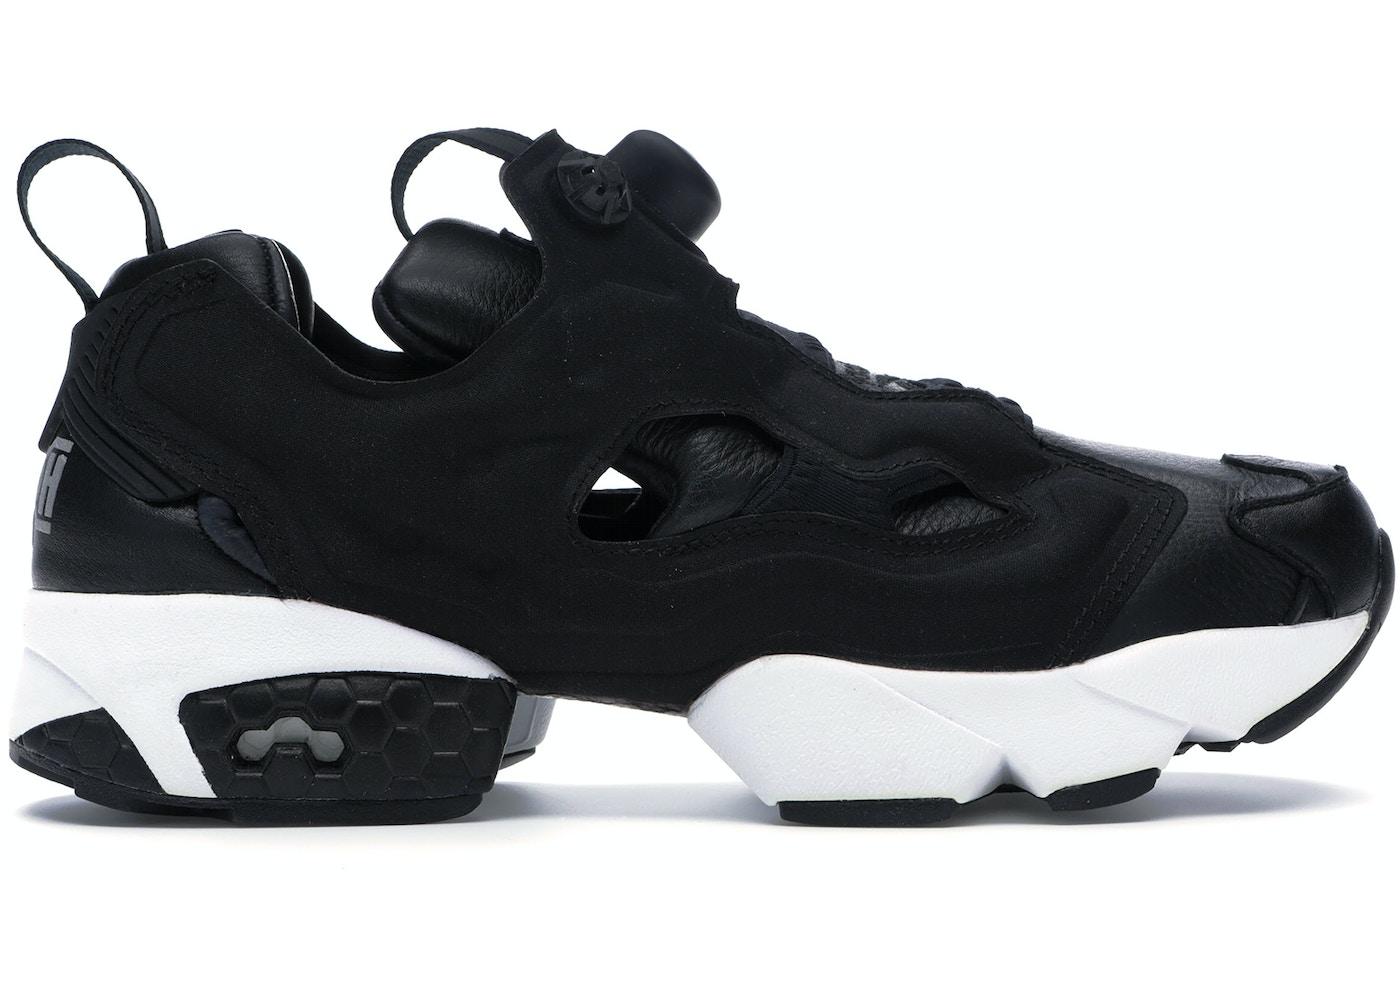 9747ece0849 Reebok Shoes - Volatility